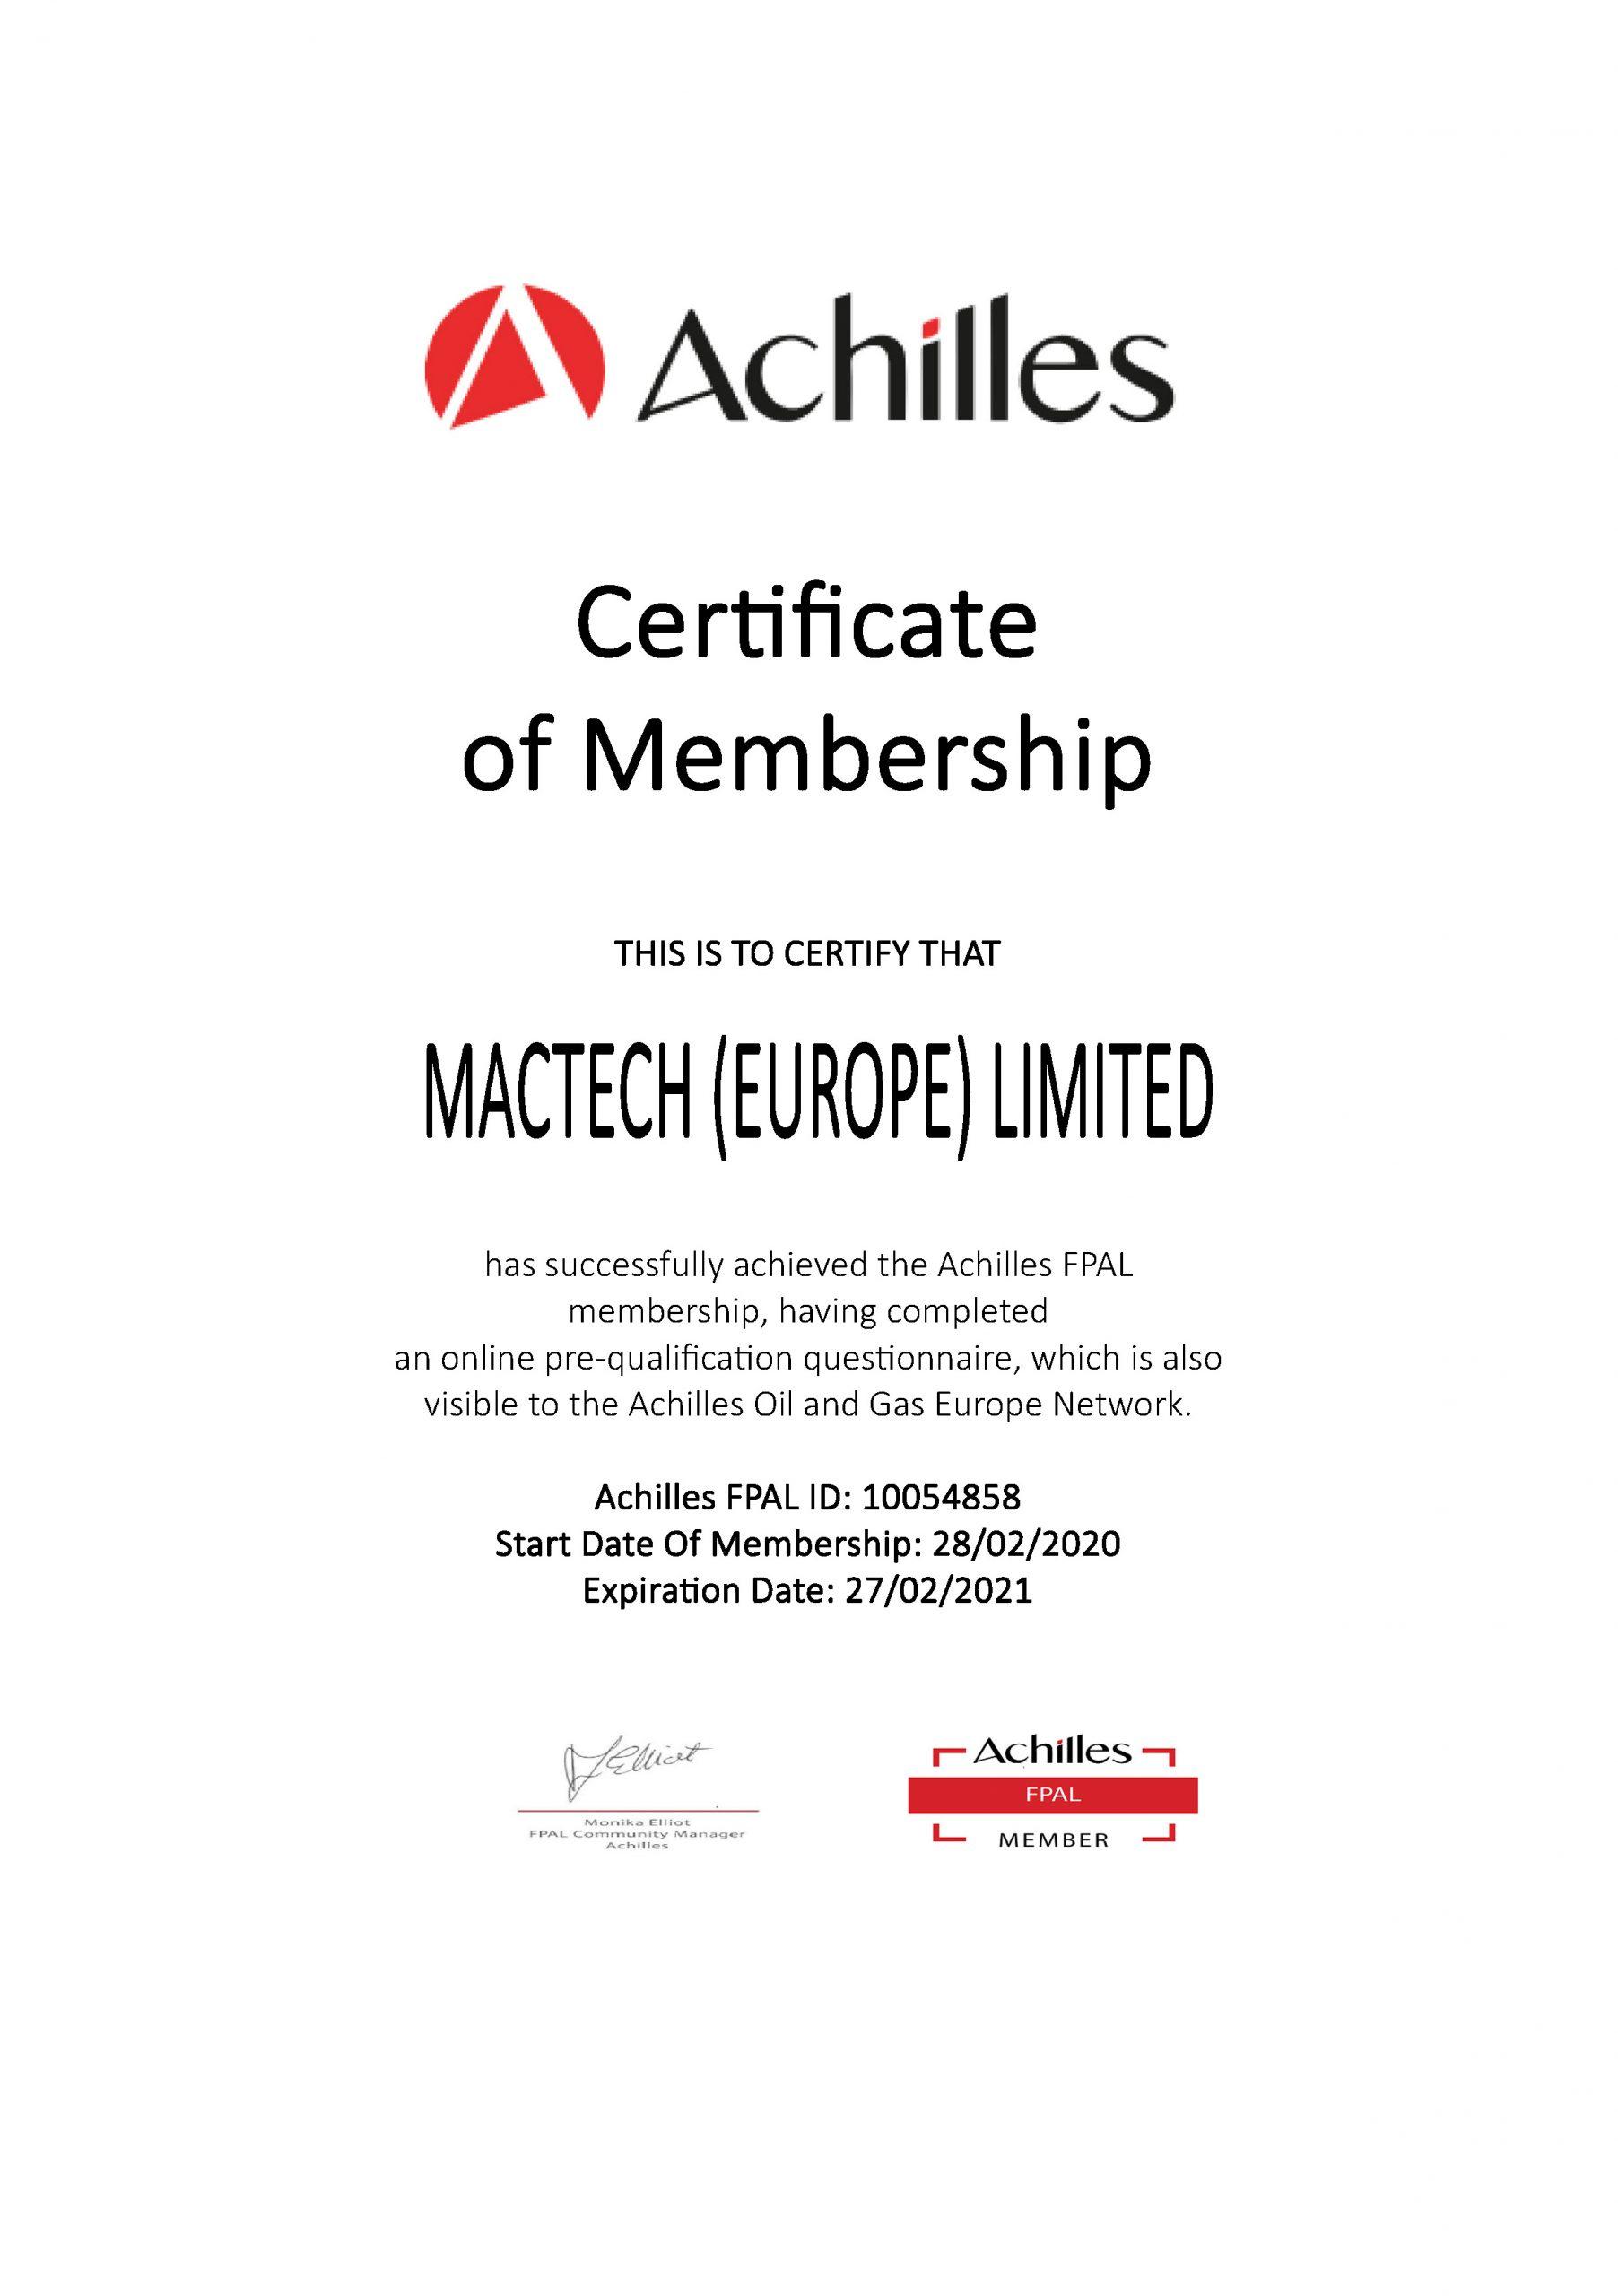 Achilles FPAL Certificate exp. 27.02.2021